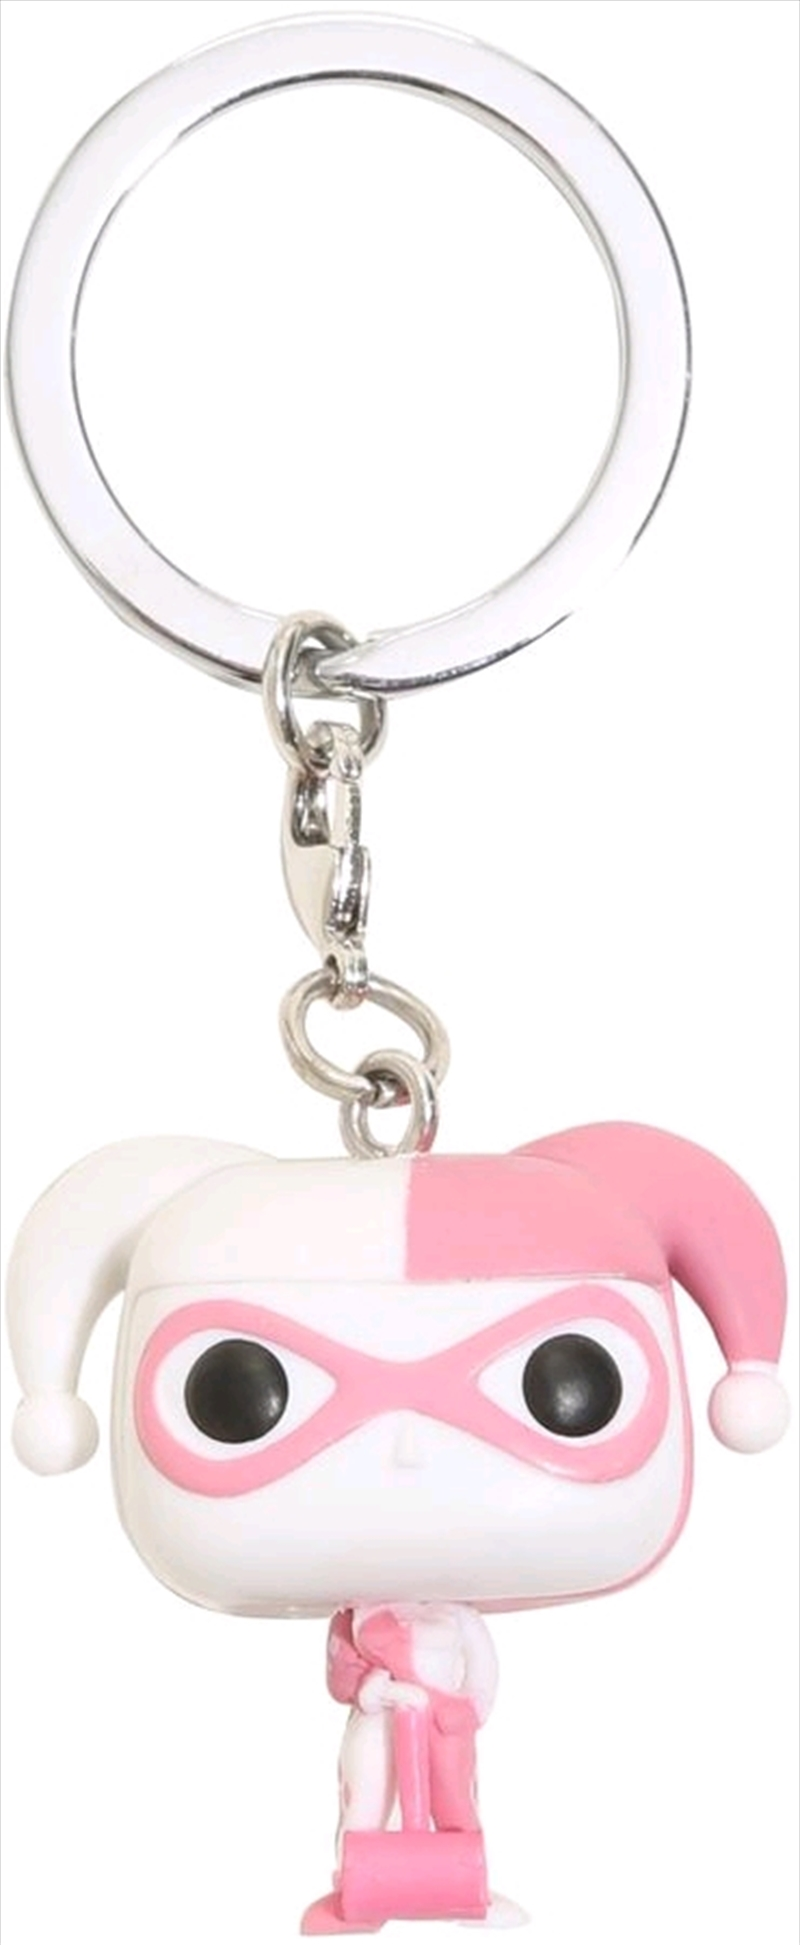 Batman - Harley Quinn Pink US Exclusive Pocket Pop! Keychain | Pop Vinyl